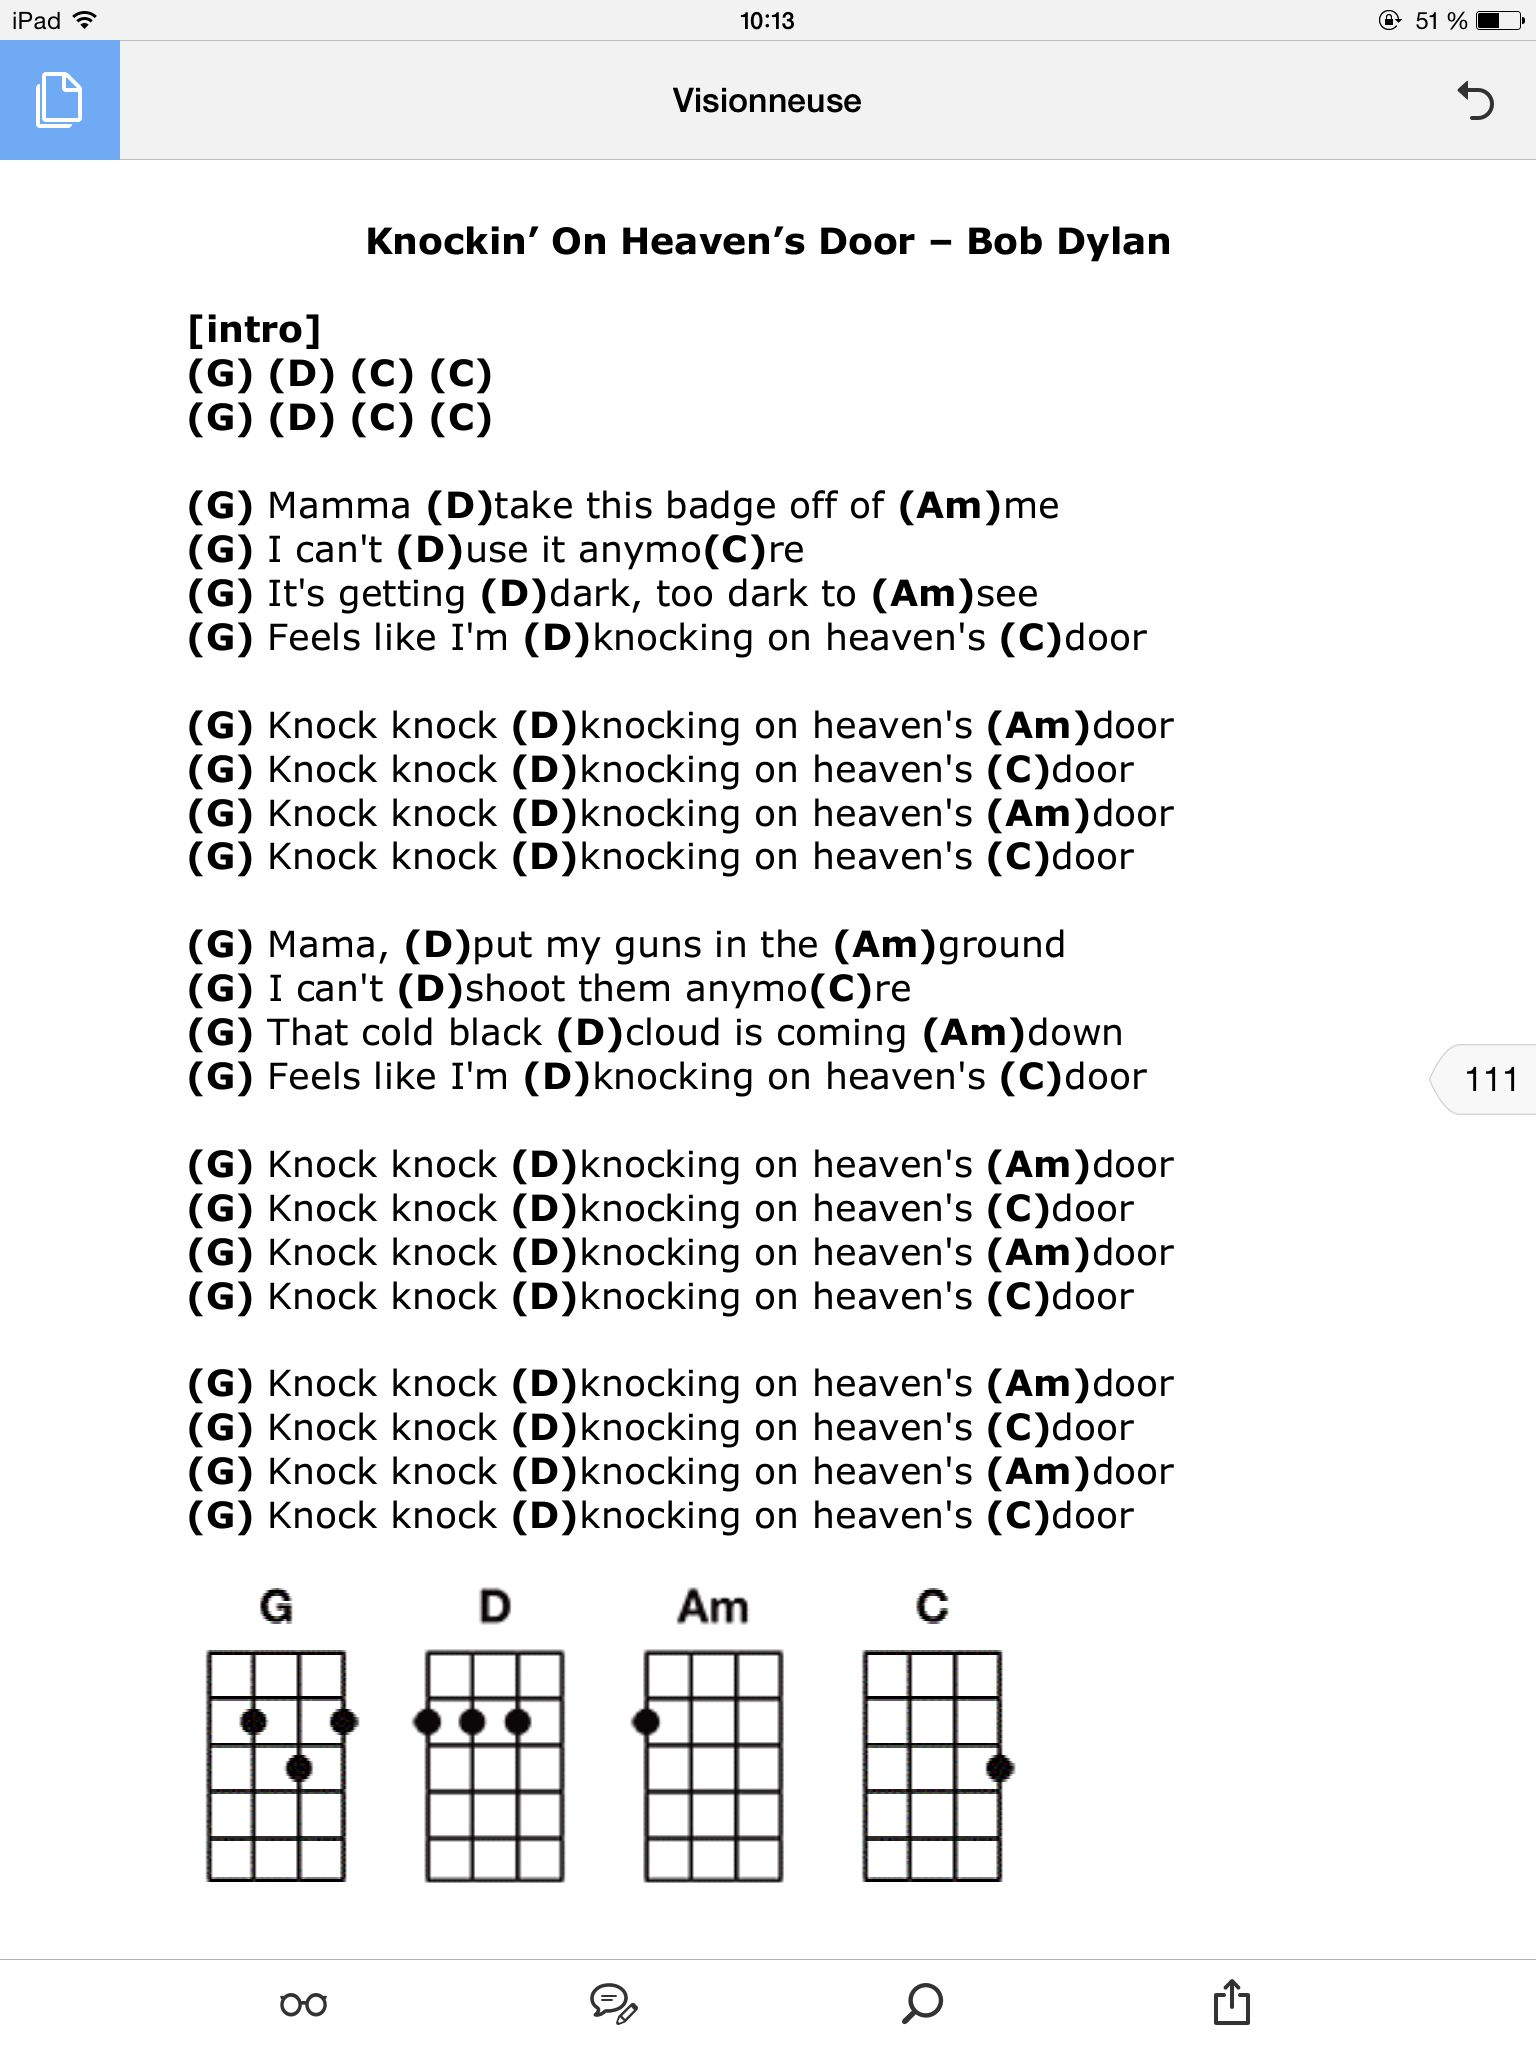 Knockin On Heavens Door Songs To Play Pinterest Guitar